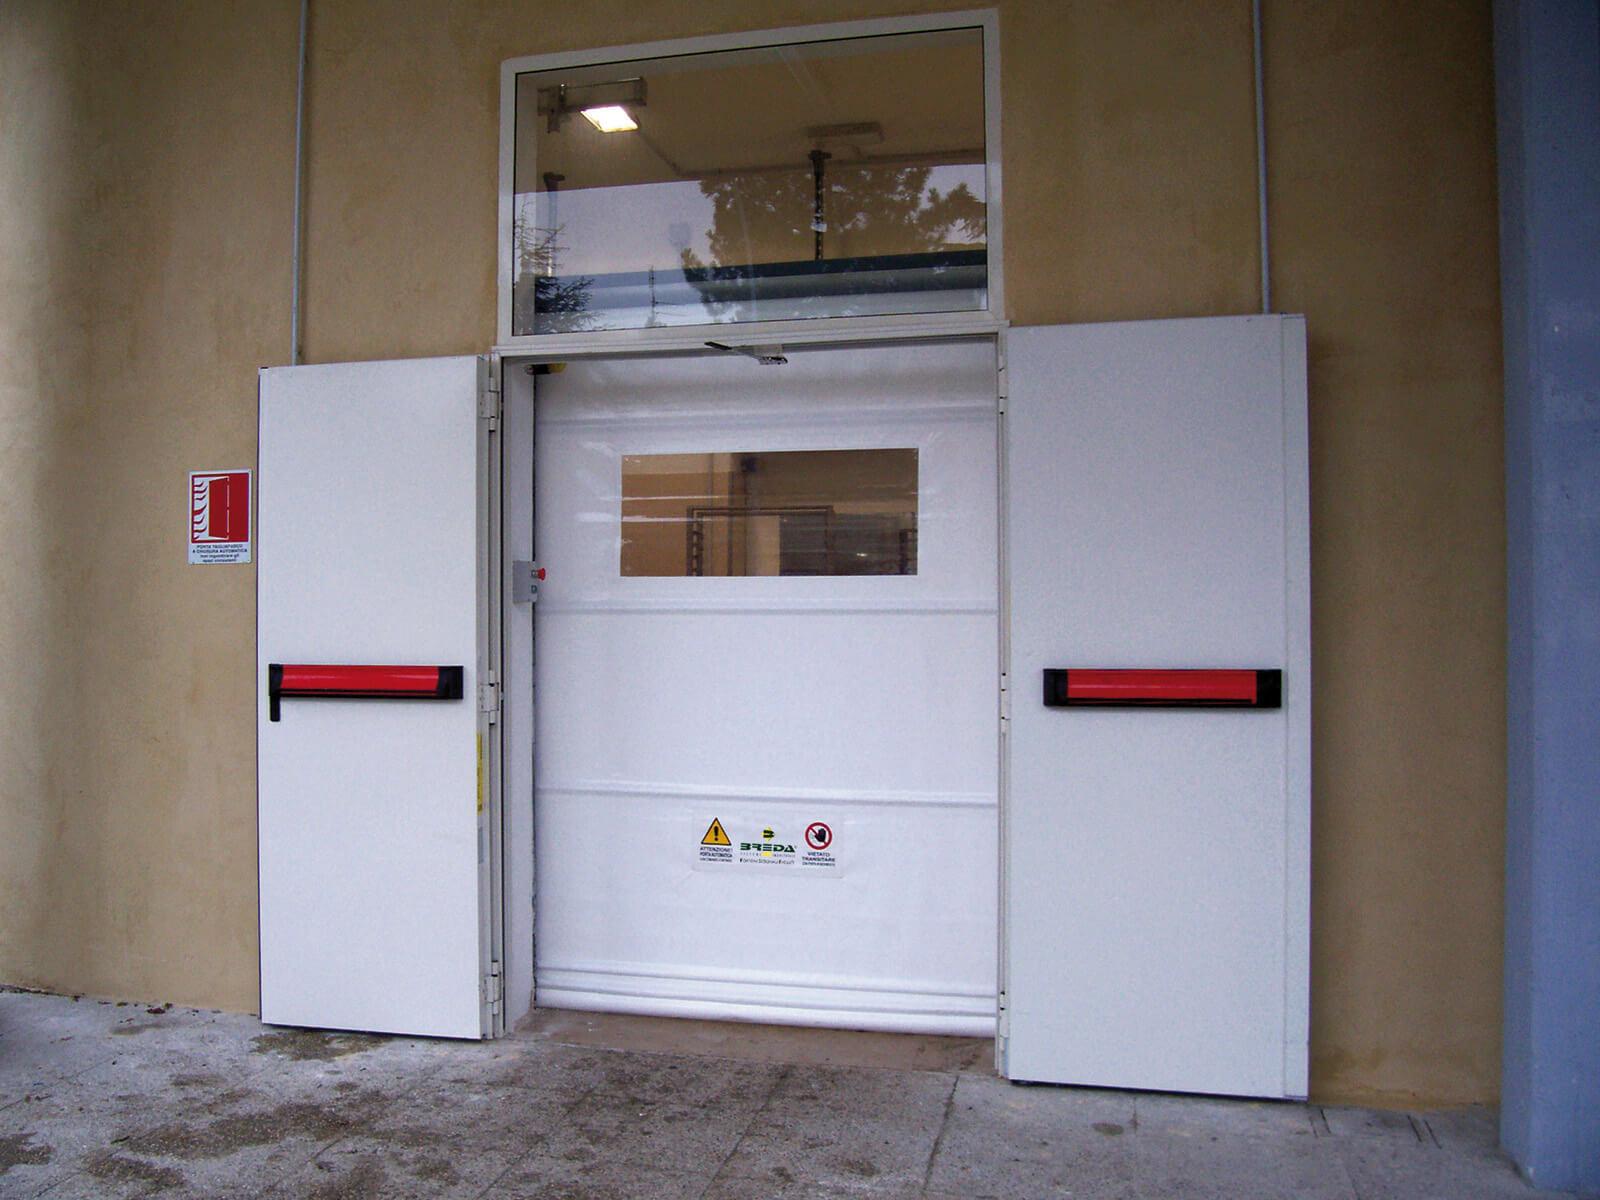 Porta rapida ad avvolgimento SAETTA - Bianco RAL 9010